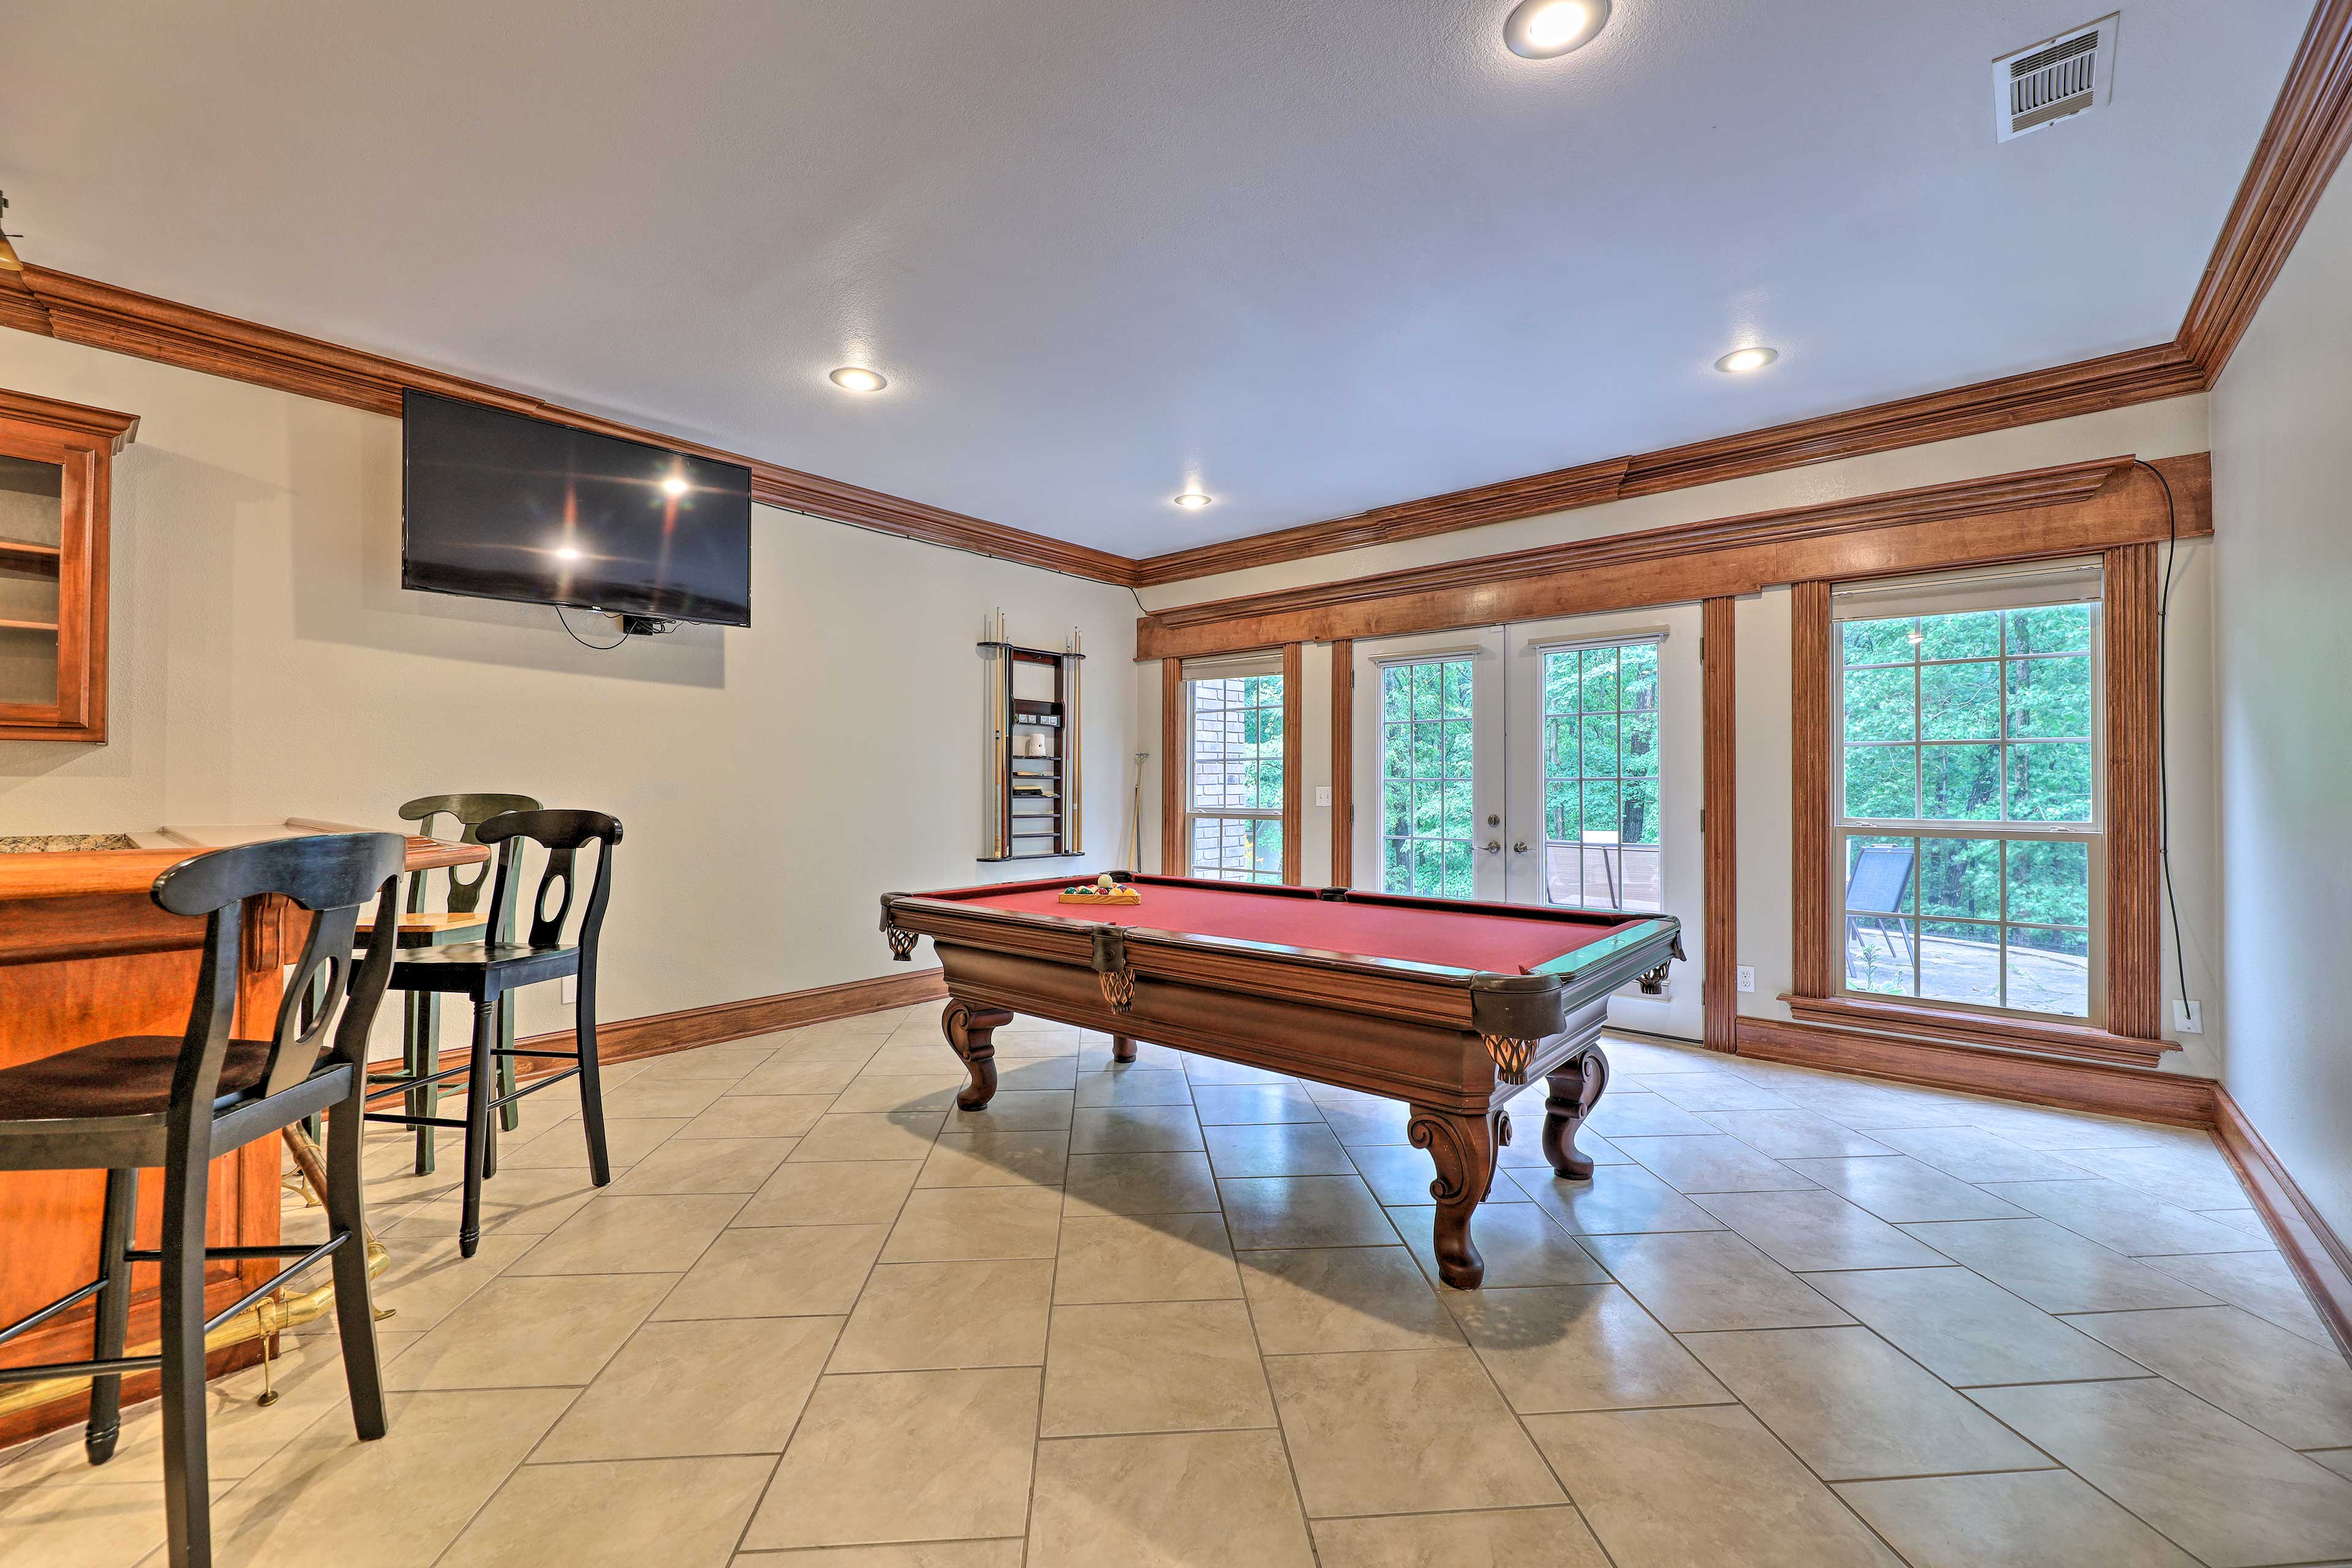 Billiards Room   Outdoor Access